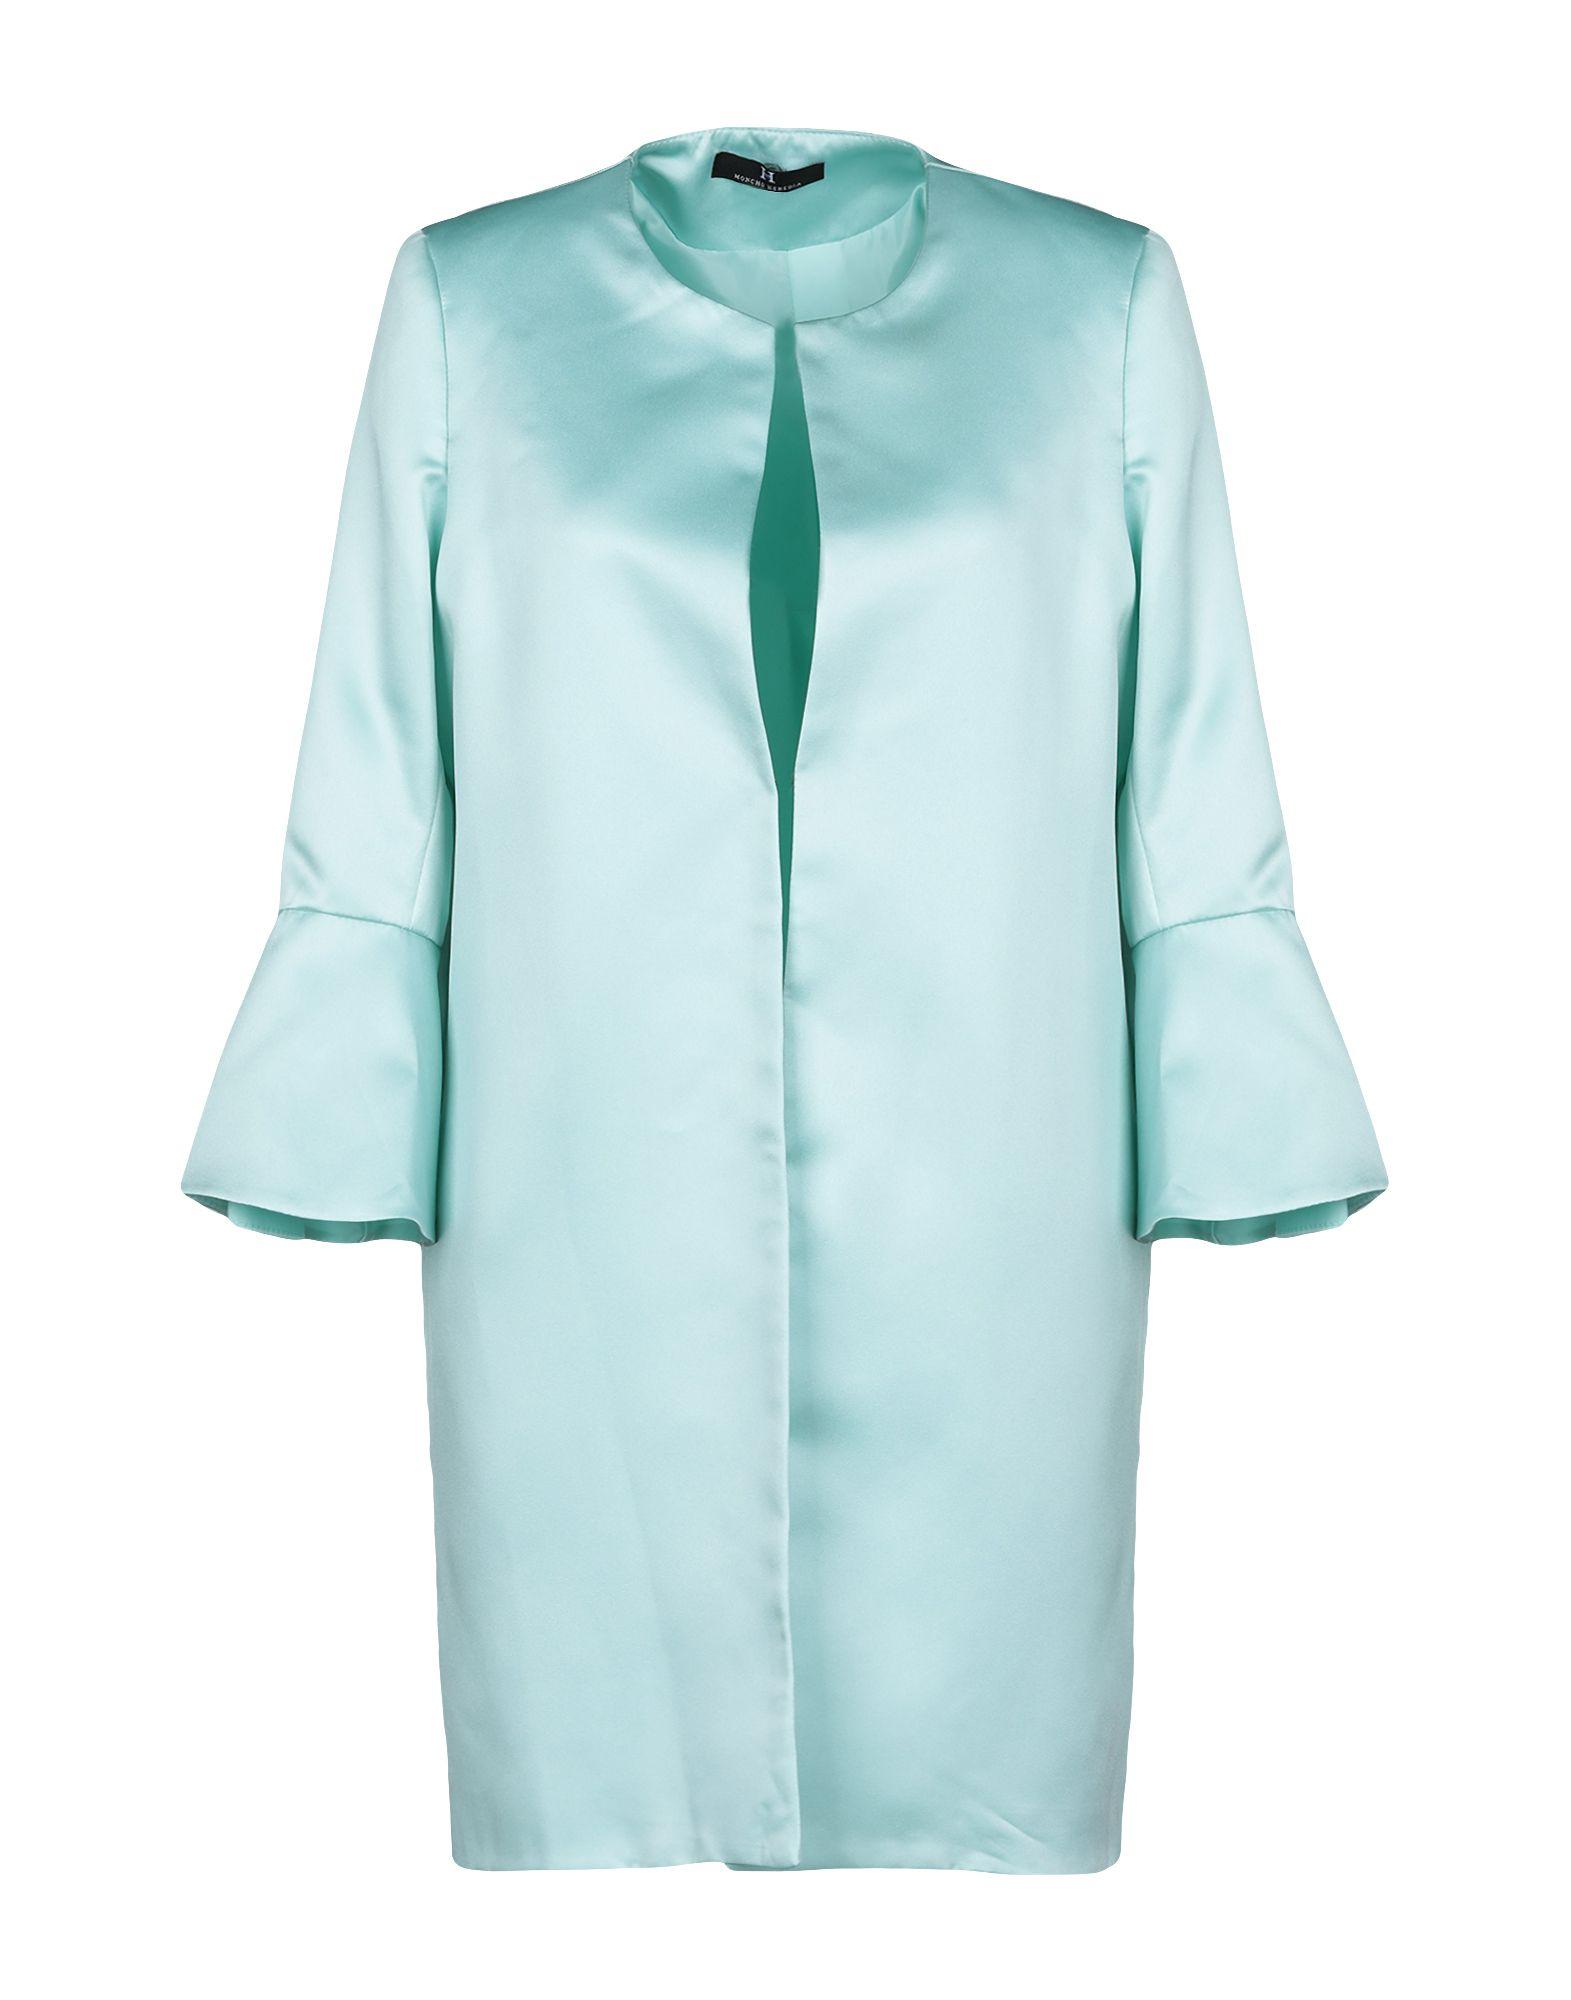 MONCHO HEREDIA Легкое пальто moncho heredia платье длиной 3 4